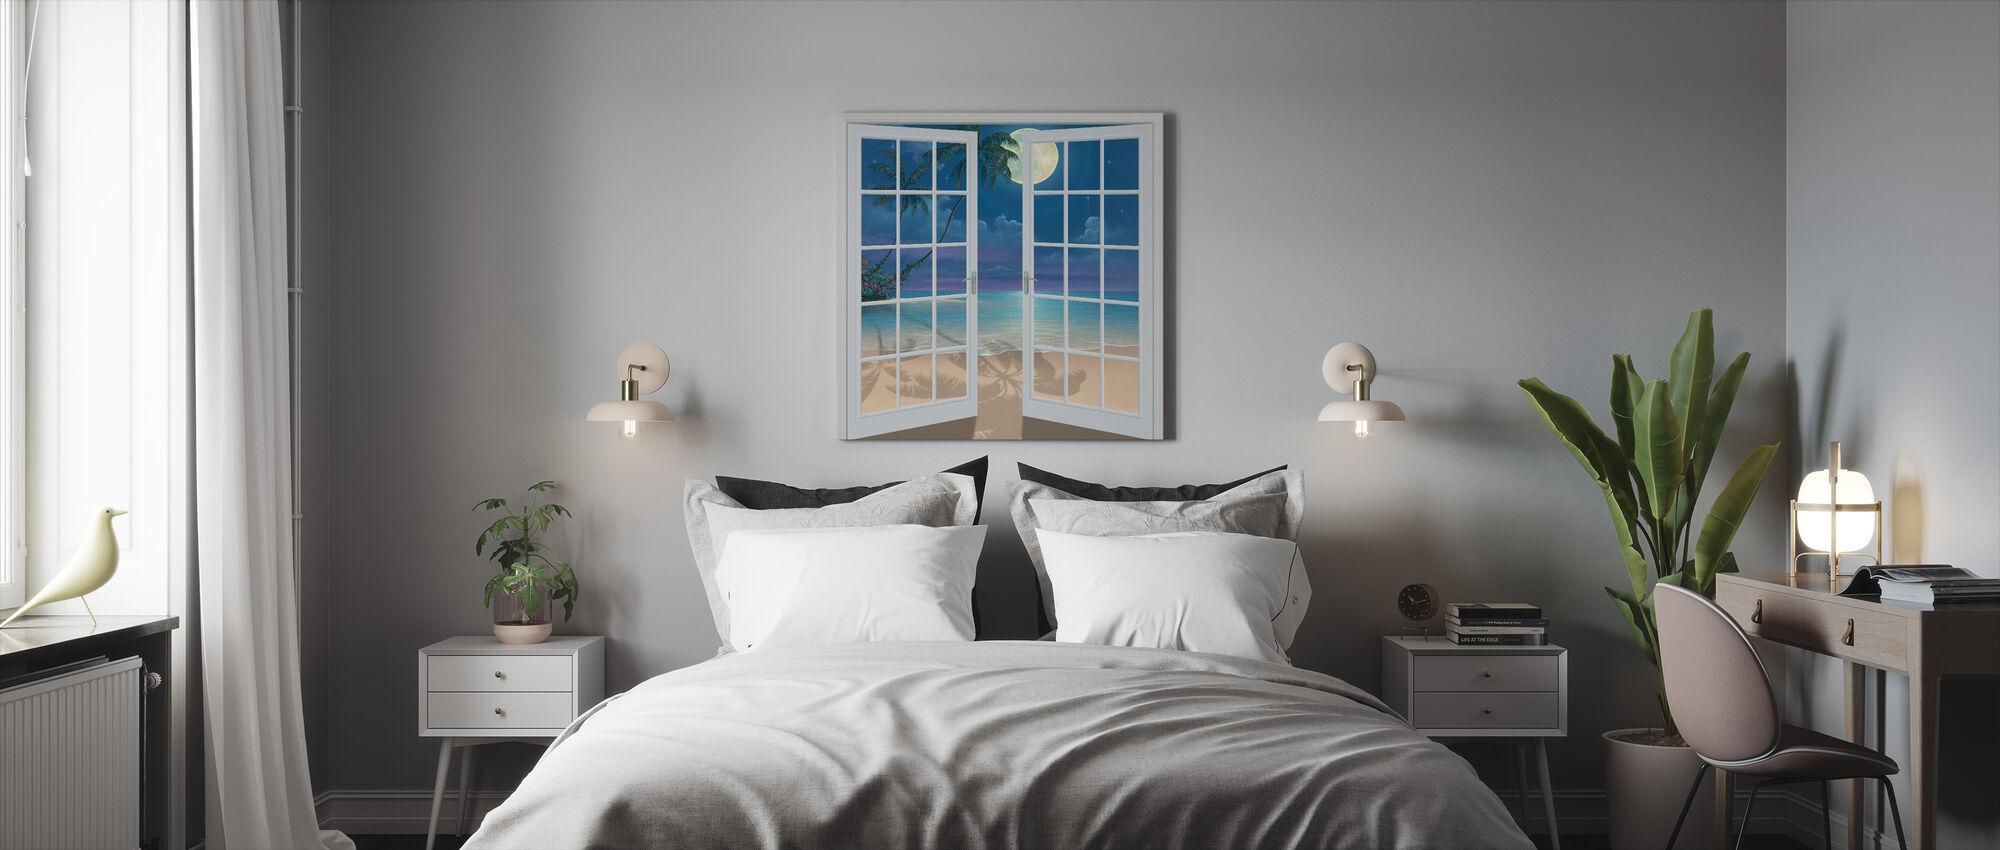 Månen skuggor - Canvastavla - Sovrum